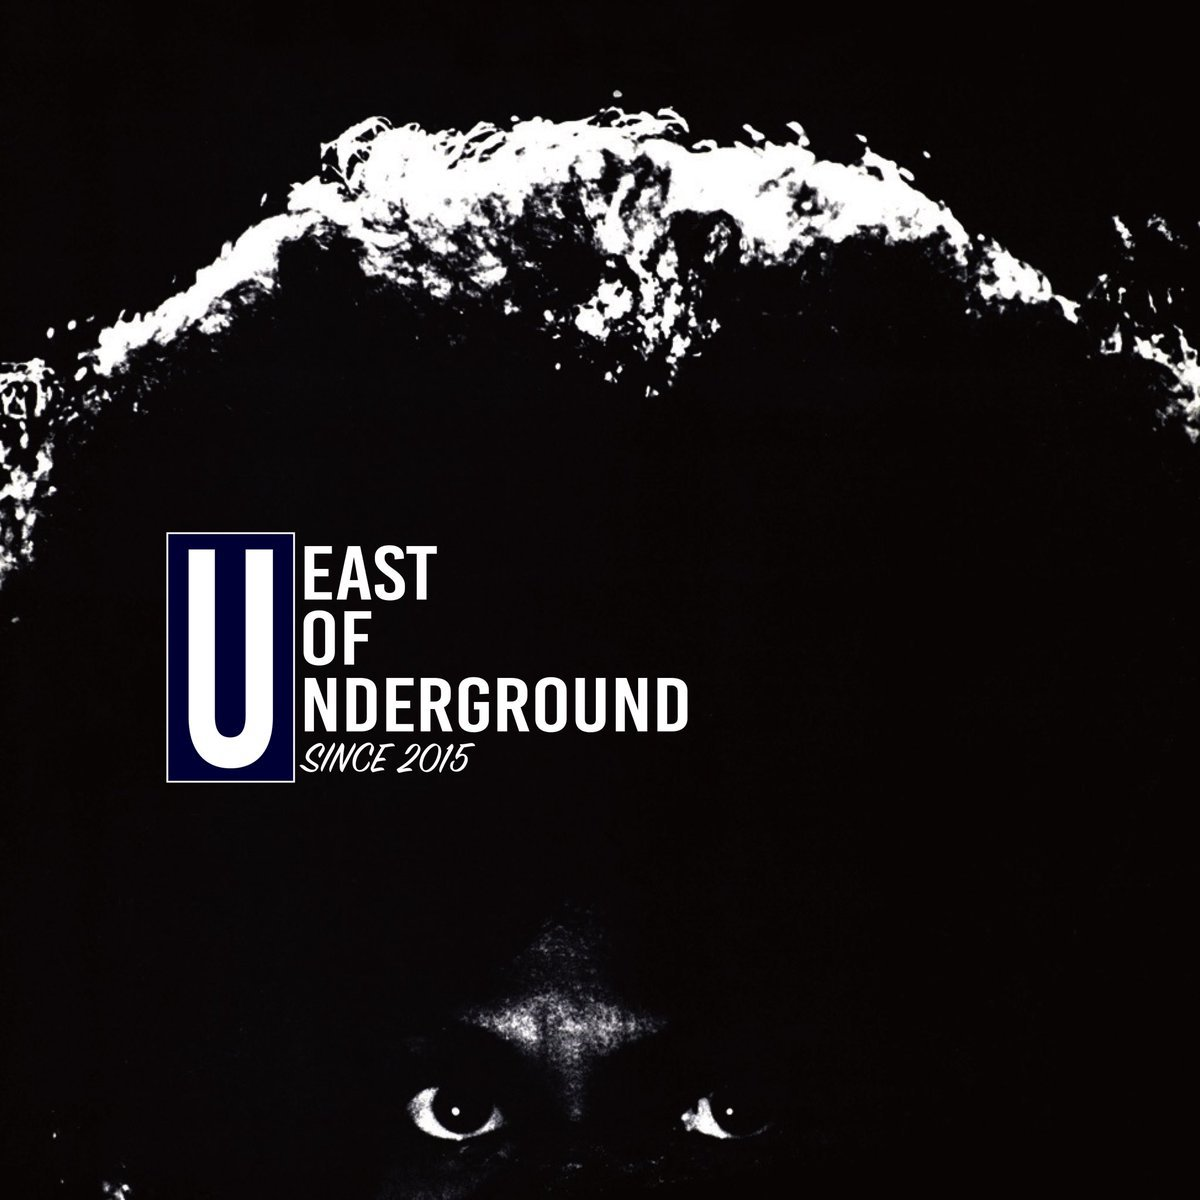 EAST OF UNDERGROUND  4th ANNIVERSARY  レポ_e0115904_23403823.jpg